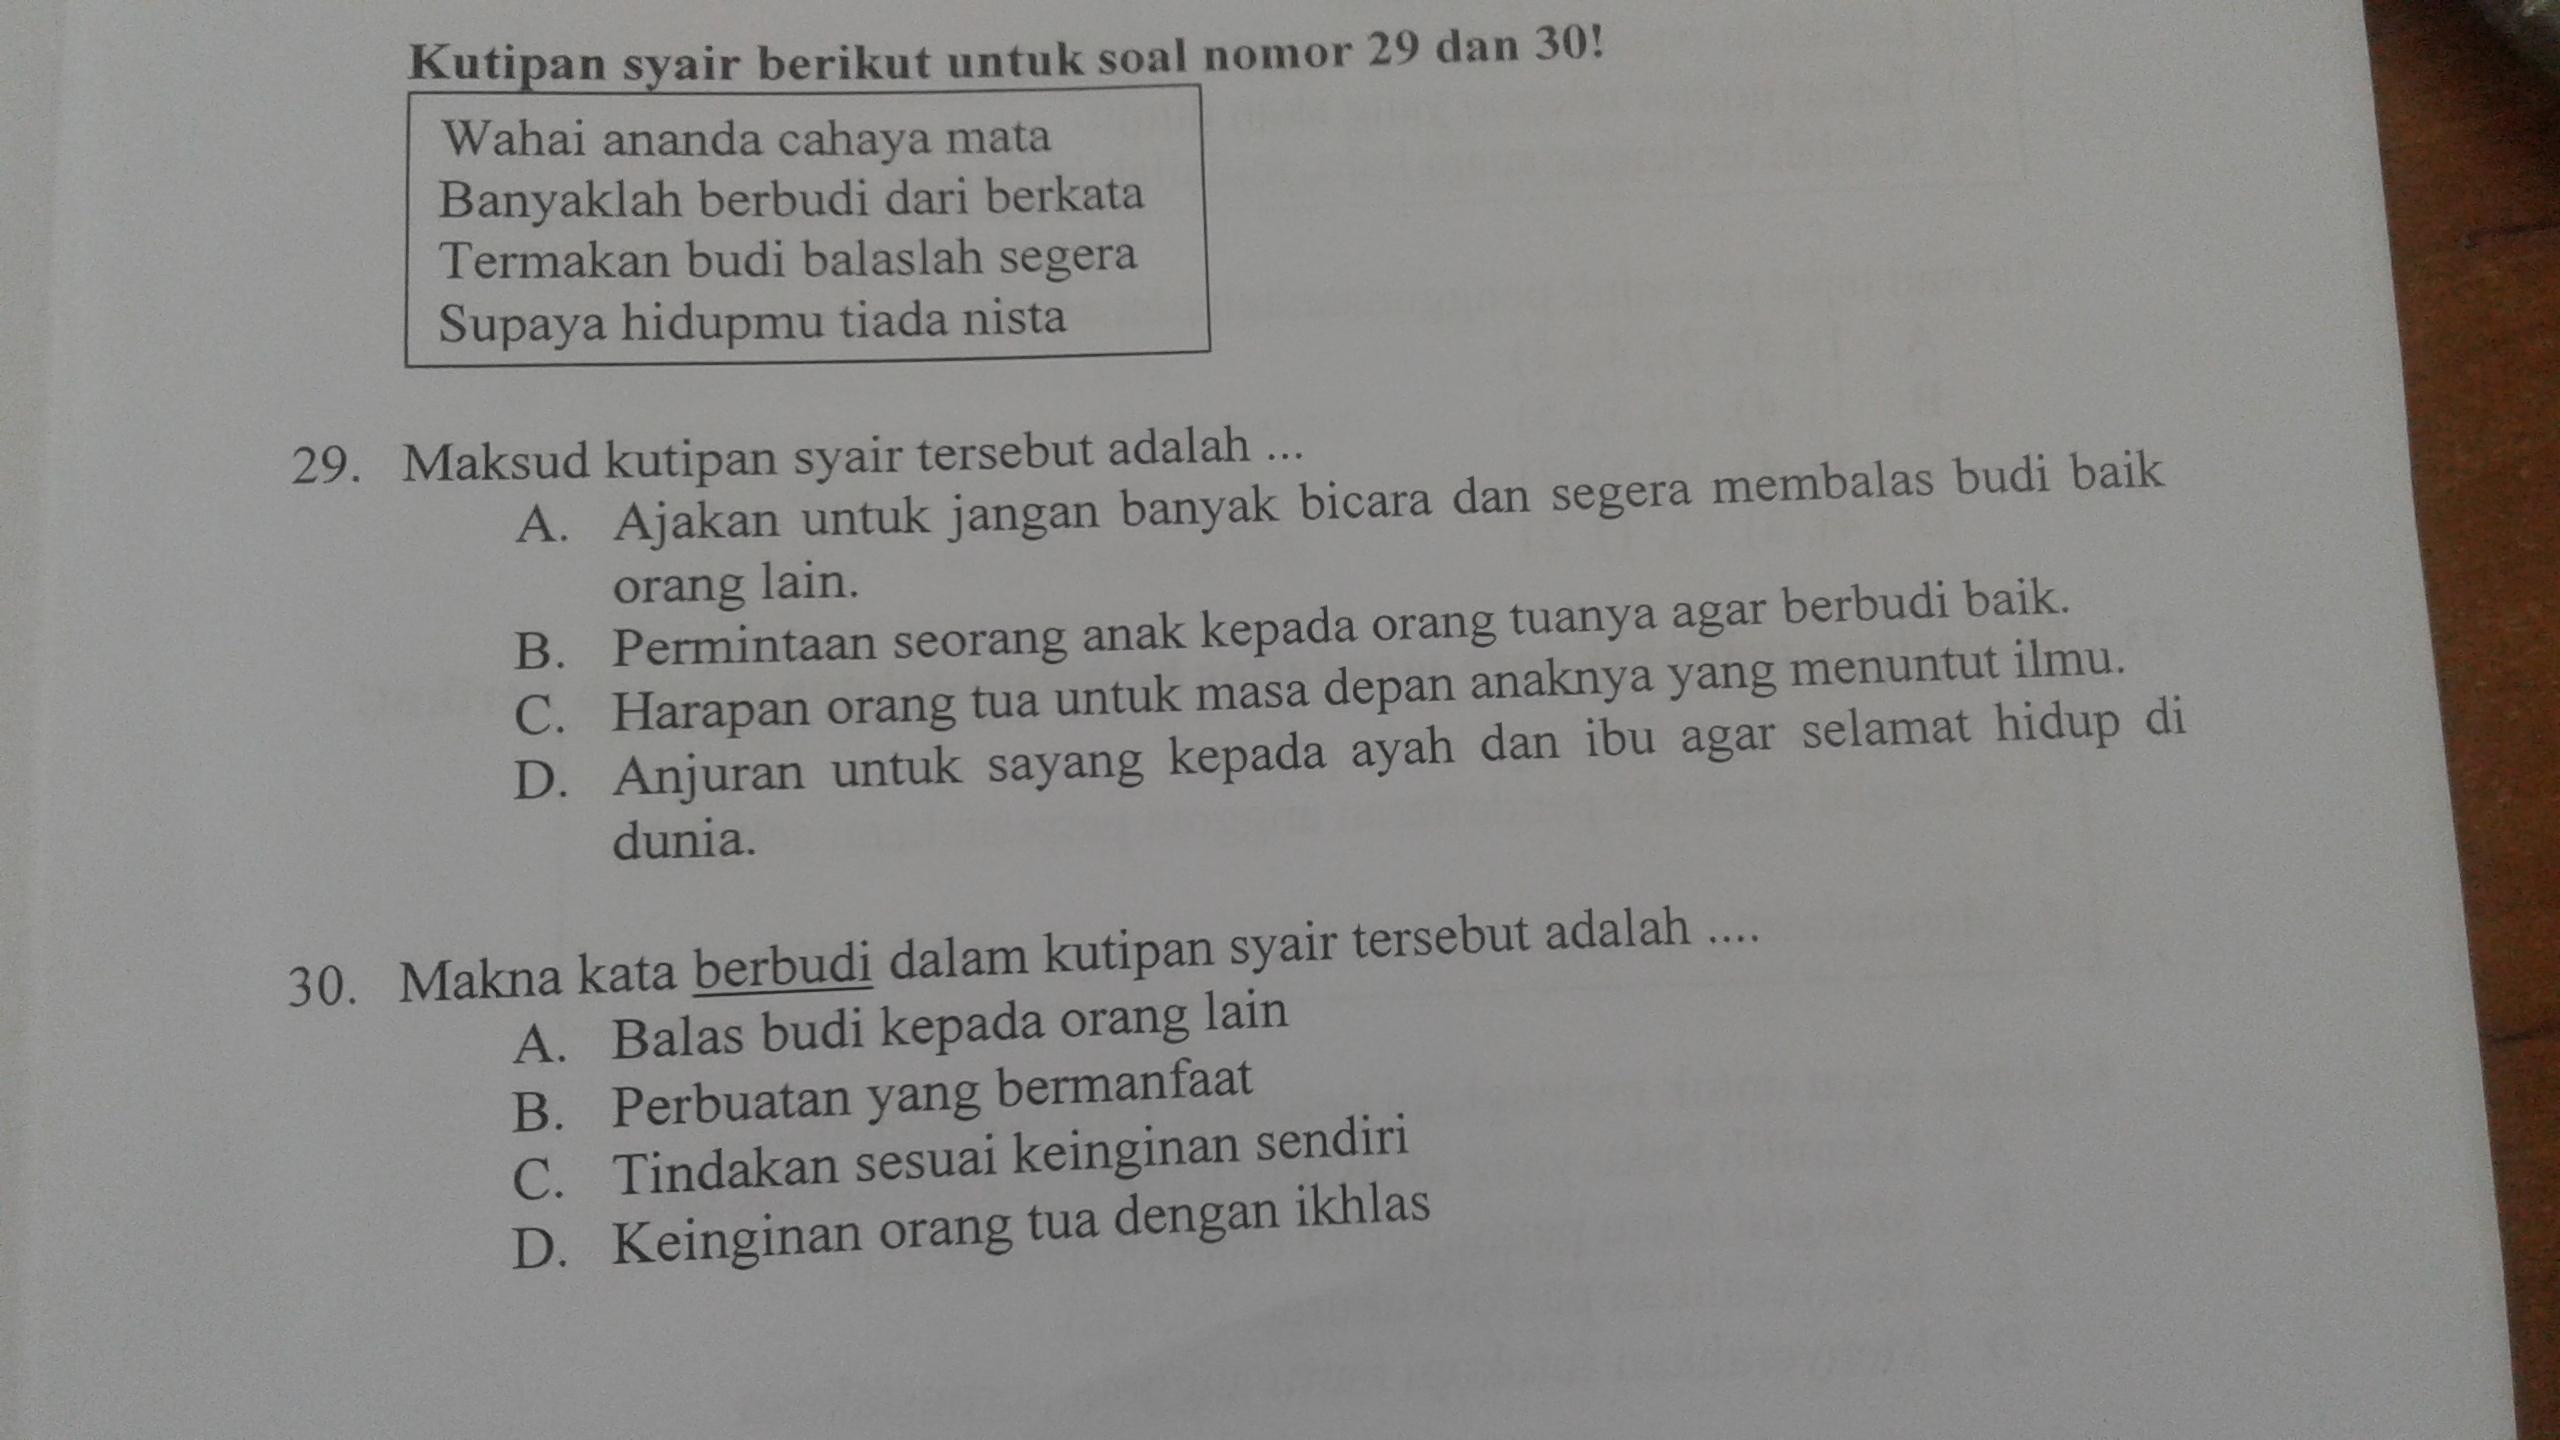 Apa Jawaban No 29 Dan 30 Brainly Co Id